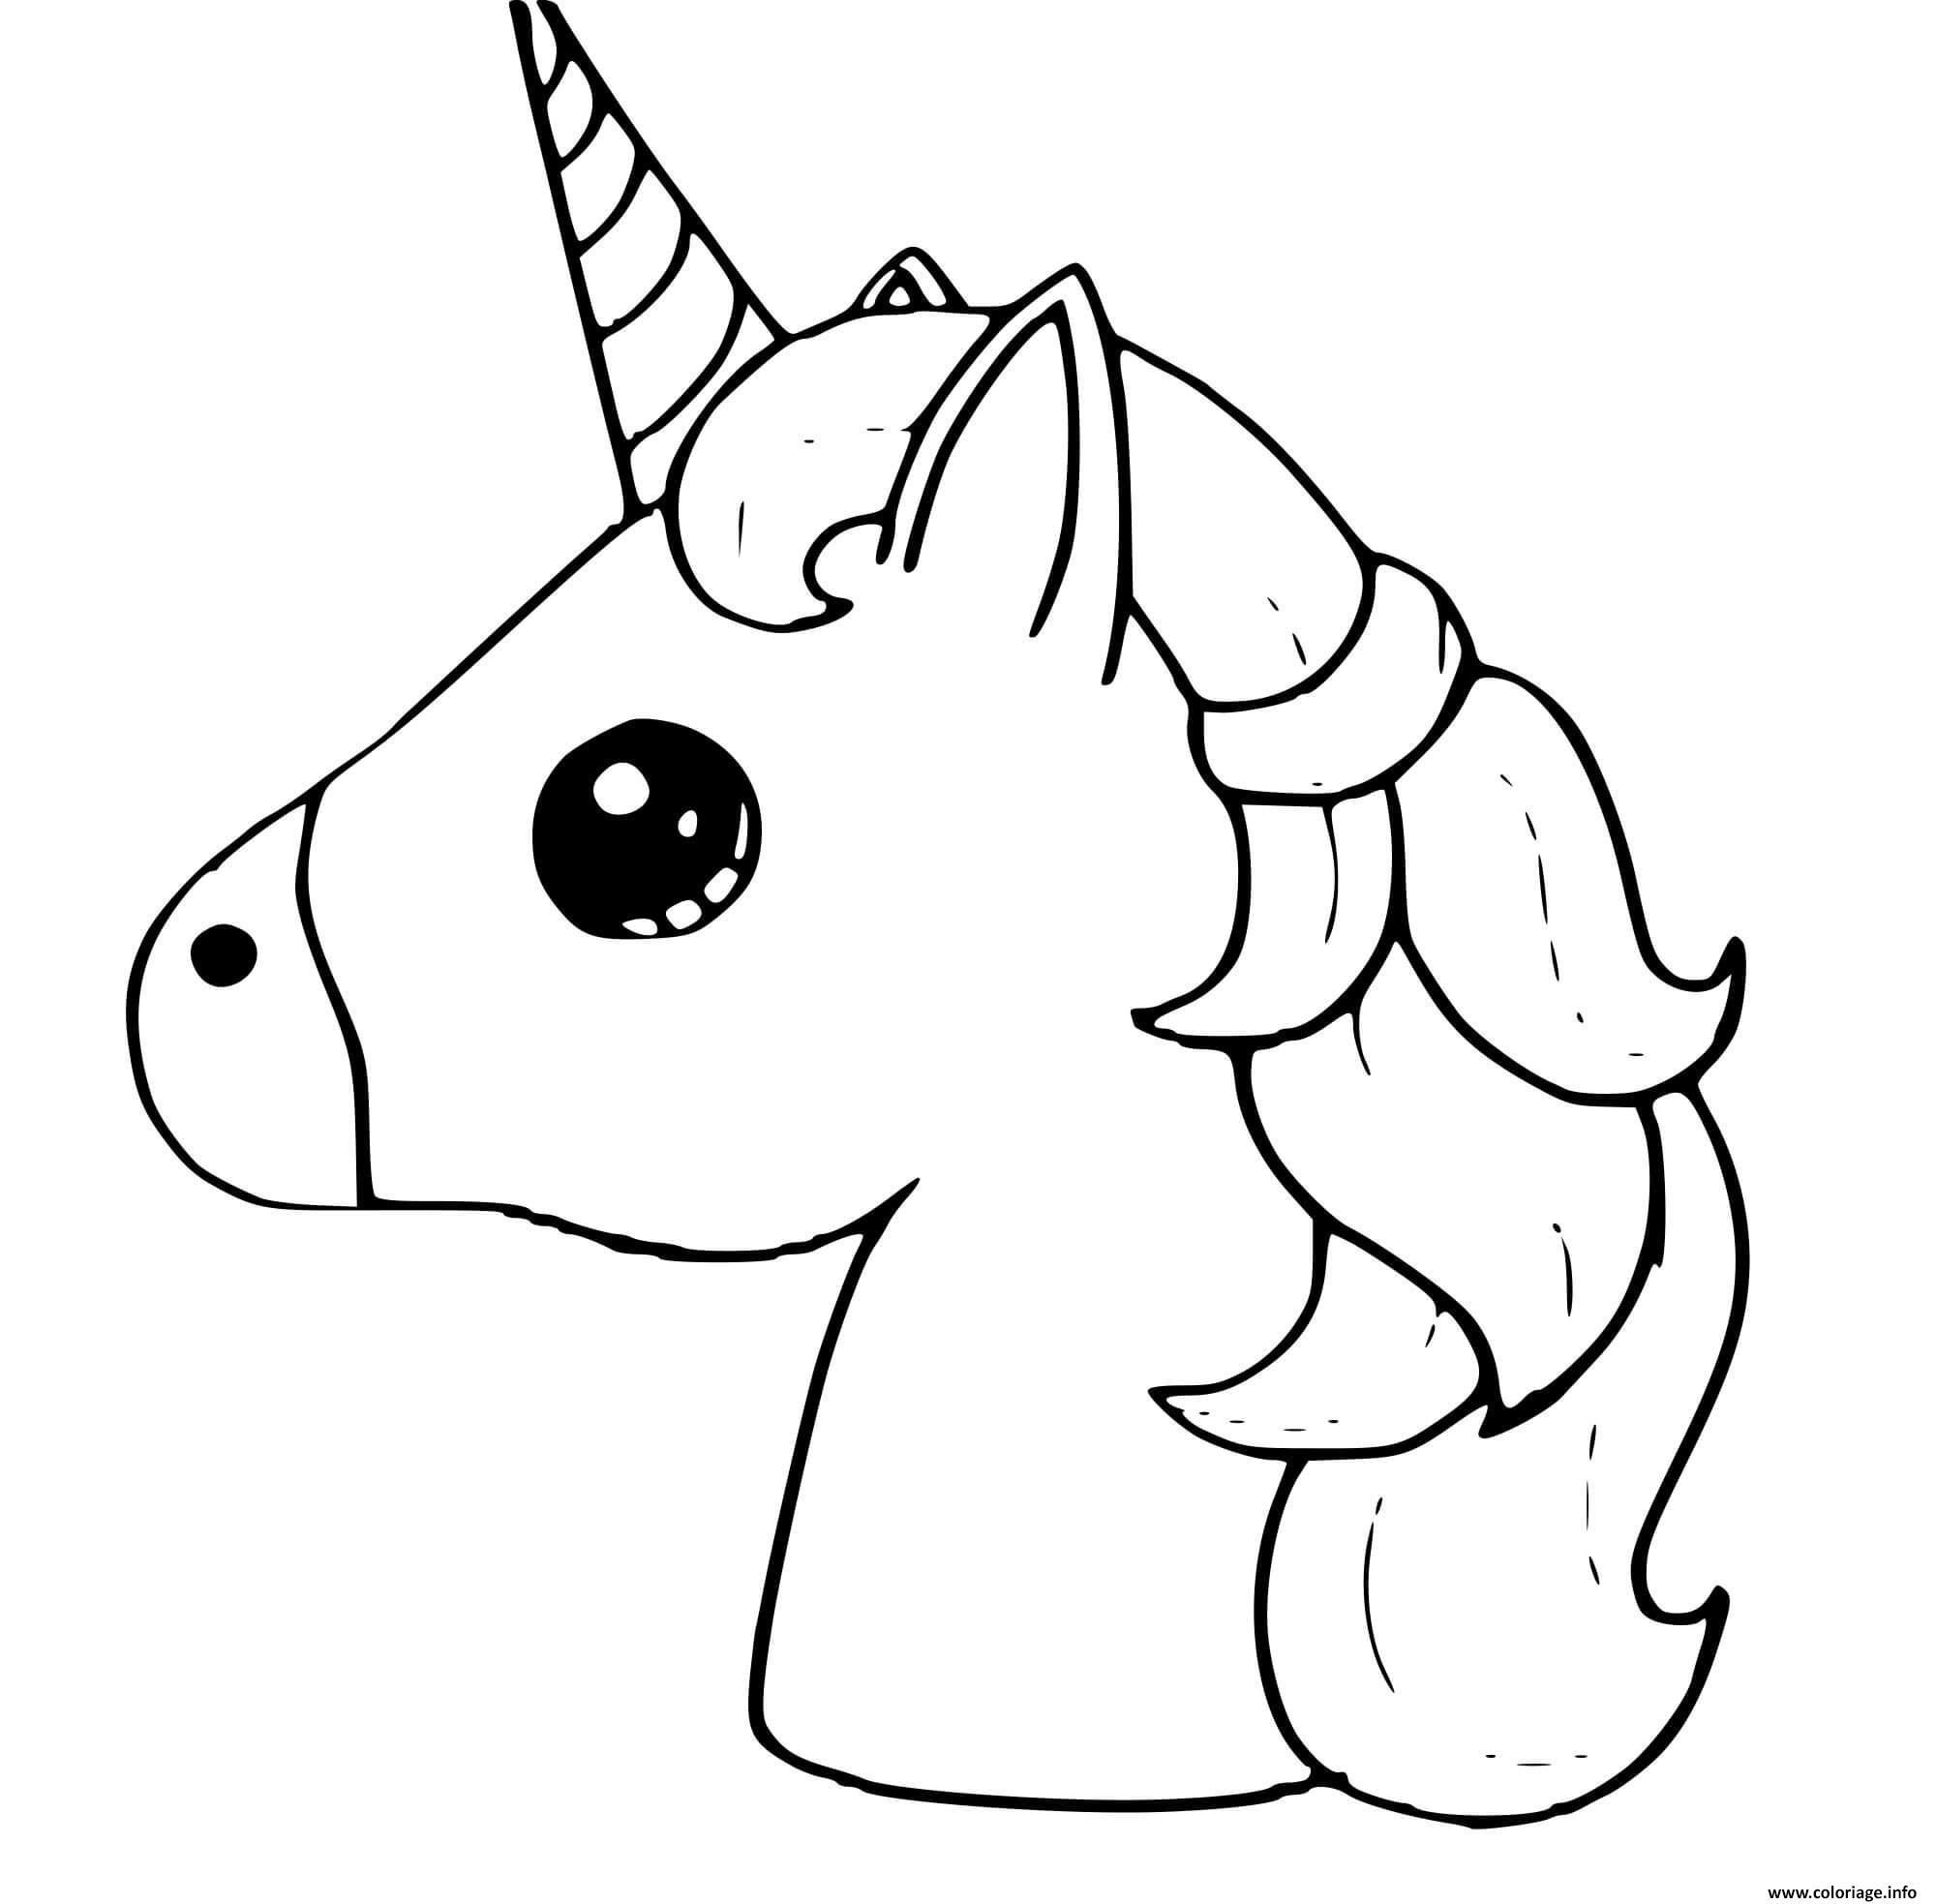 Coloriage Cute Licorne Emoji Kawaii Dessin Licorne A Imprimer